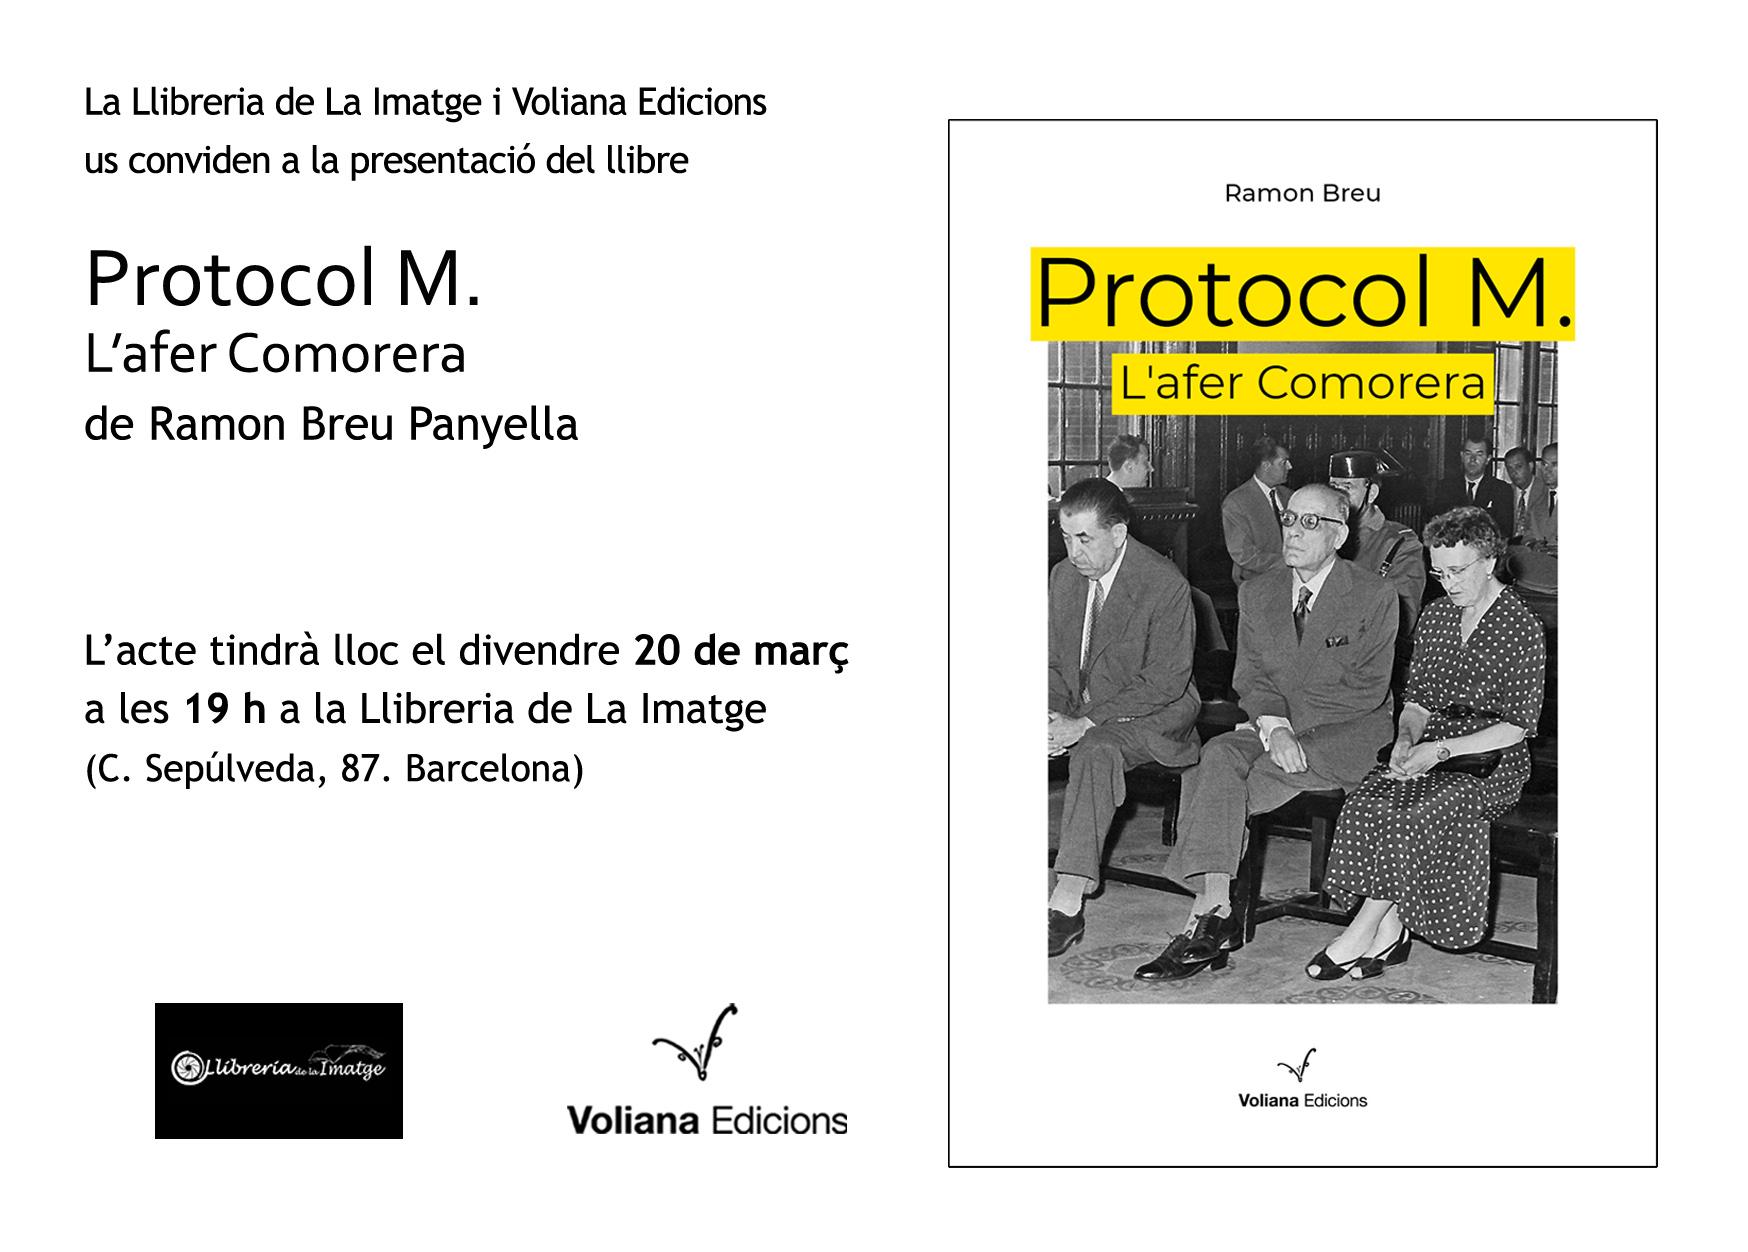 targeta Protocol M La Imatge copia (1).jpg